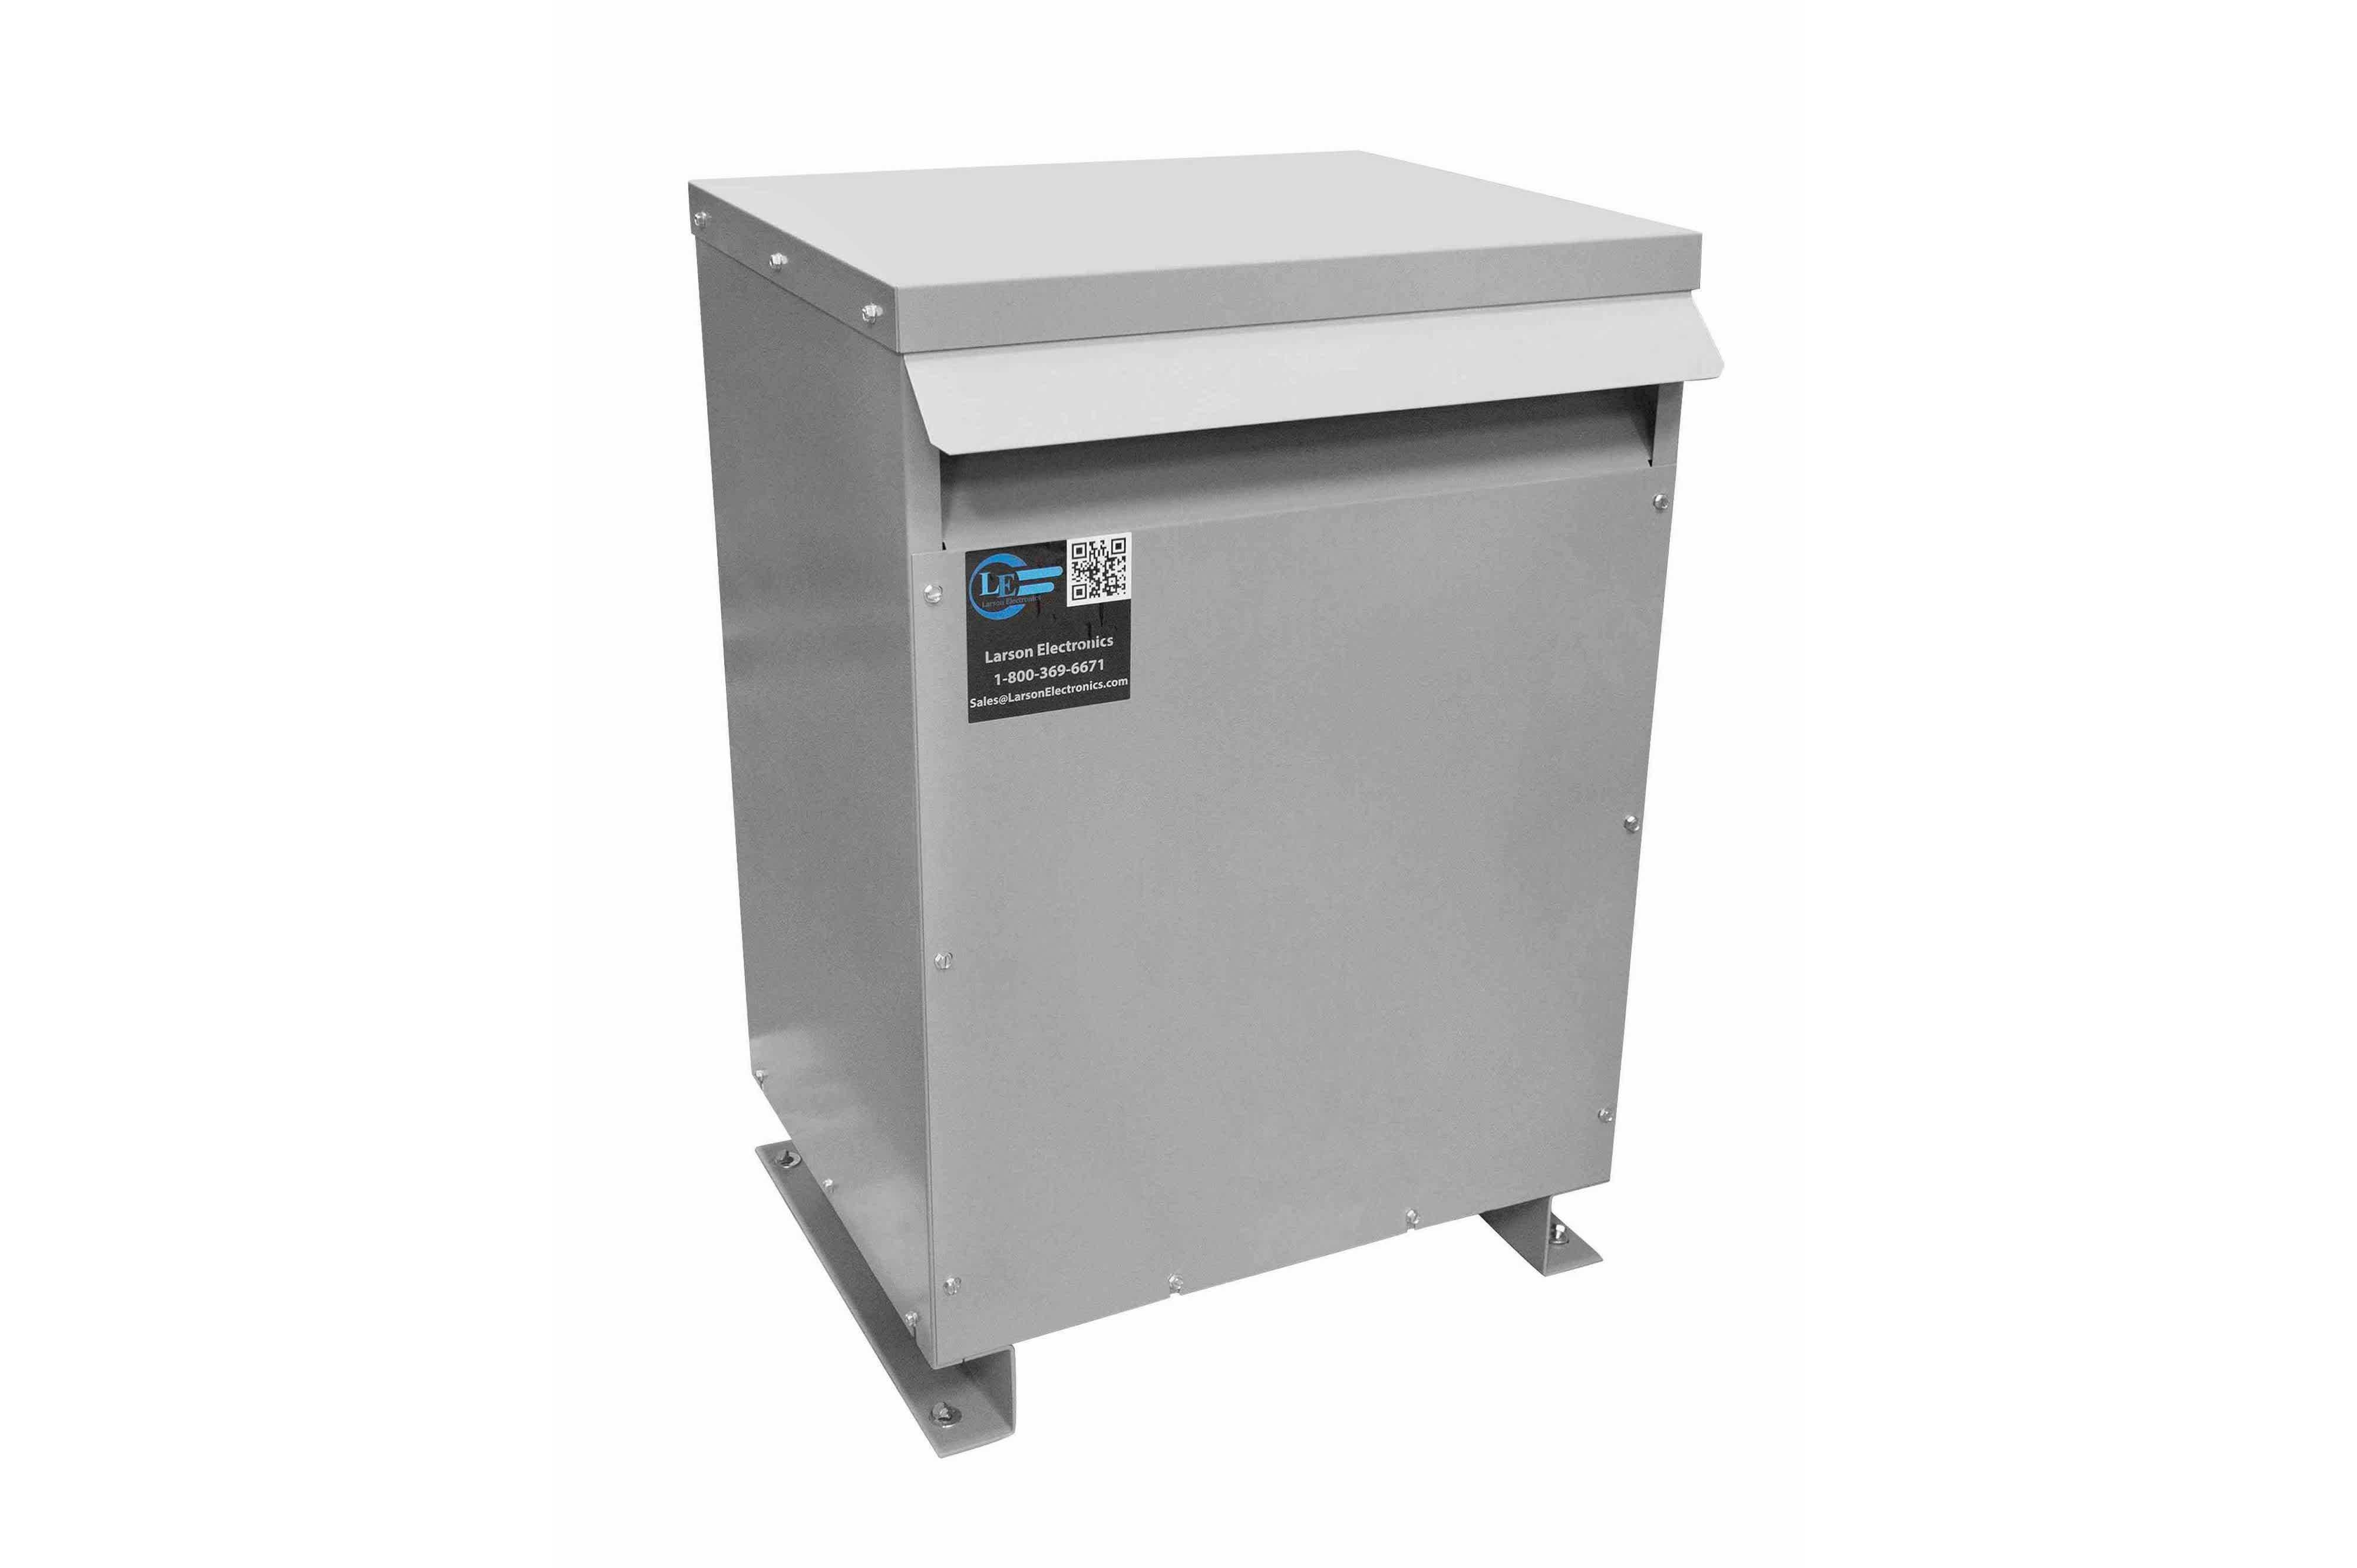 115 kVA 3PH Isolation Transformer, 575V Wye Primary, 208Y/120 Wye-N Secondary, N3R, Ventilated, 60 Hz